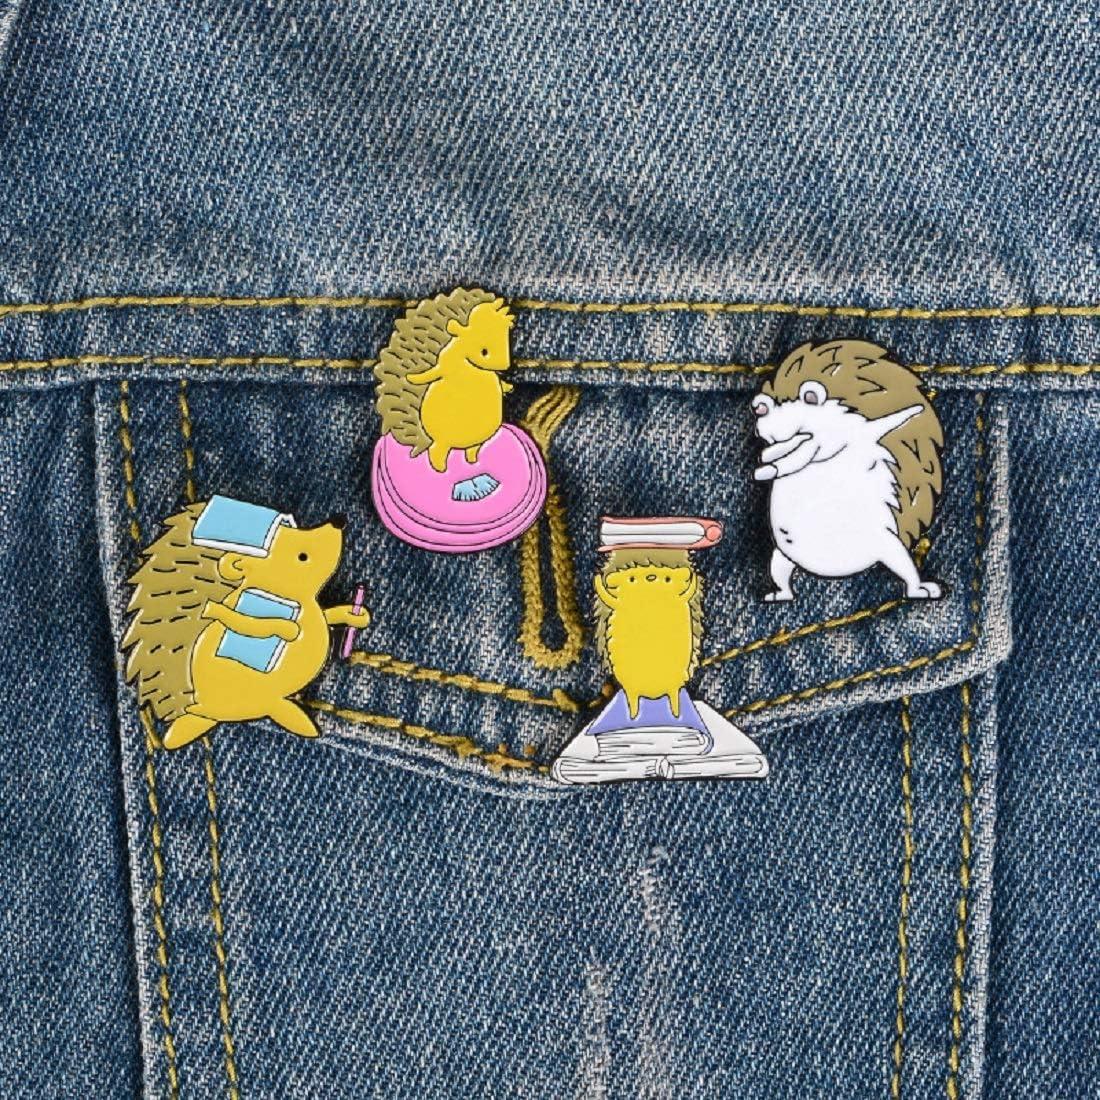 IIKENG Enamel Pins Brooch Cute Hedgehog Enamel Lapel Pin for Kids Cartoon Animal Enamel Pin Set for Backpack Cloths Hats Funny Badge Pins Jewelry Set